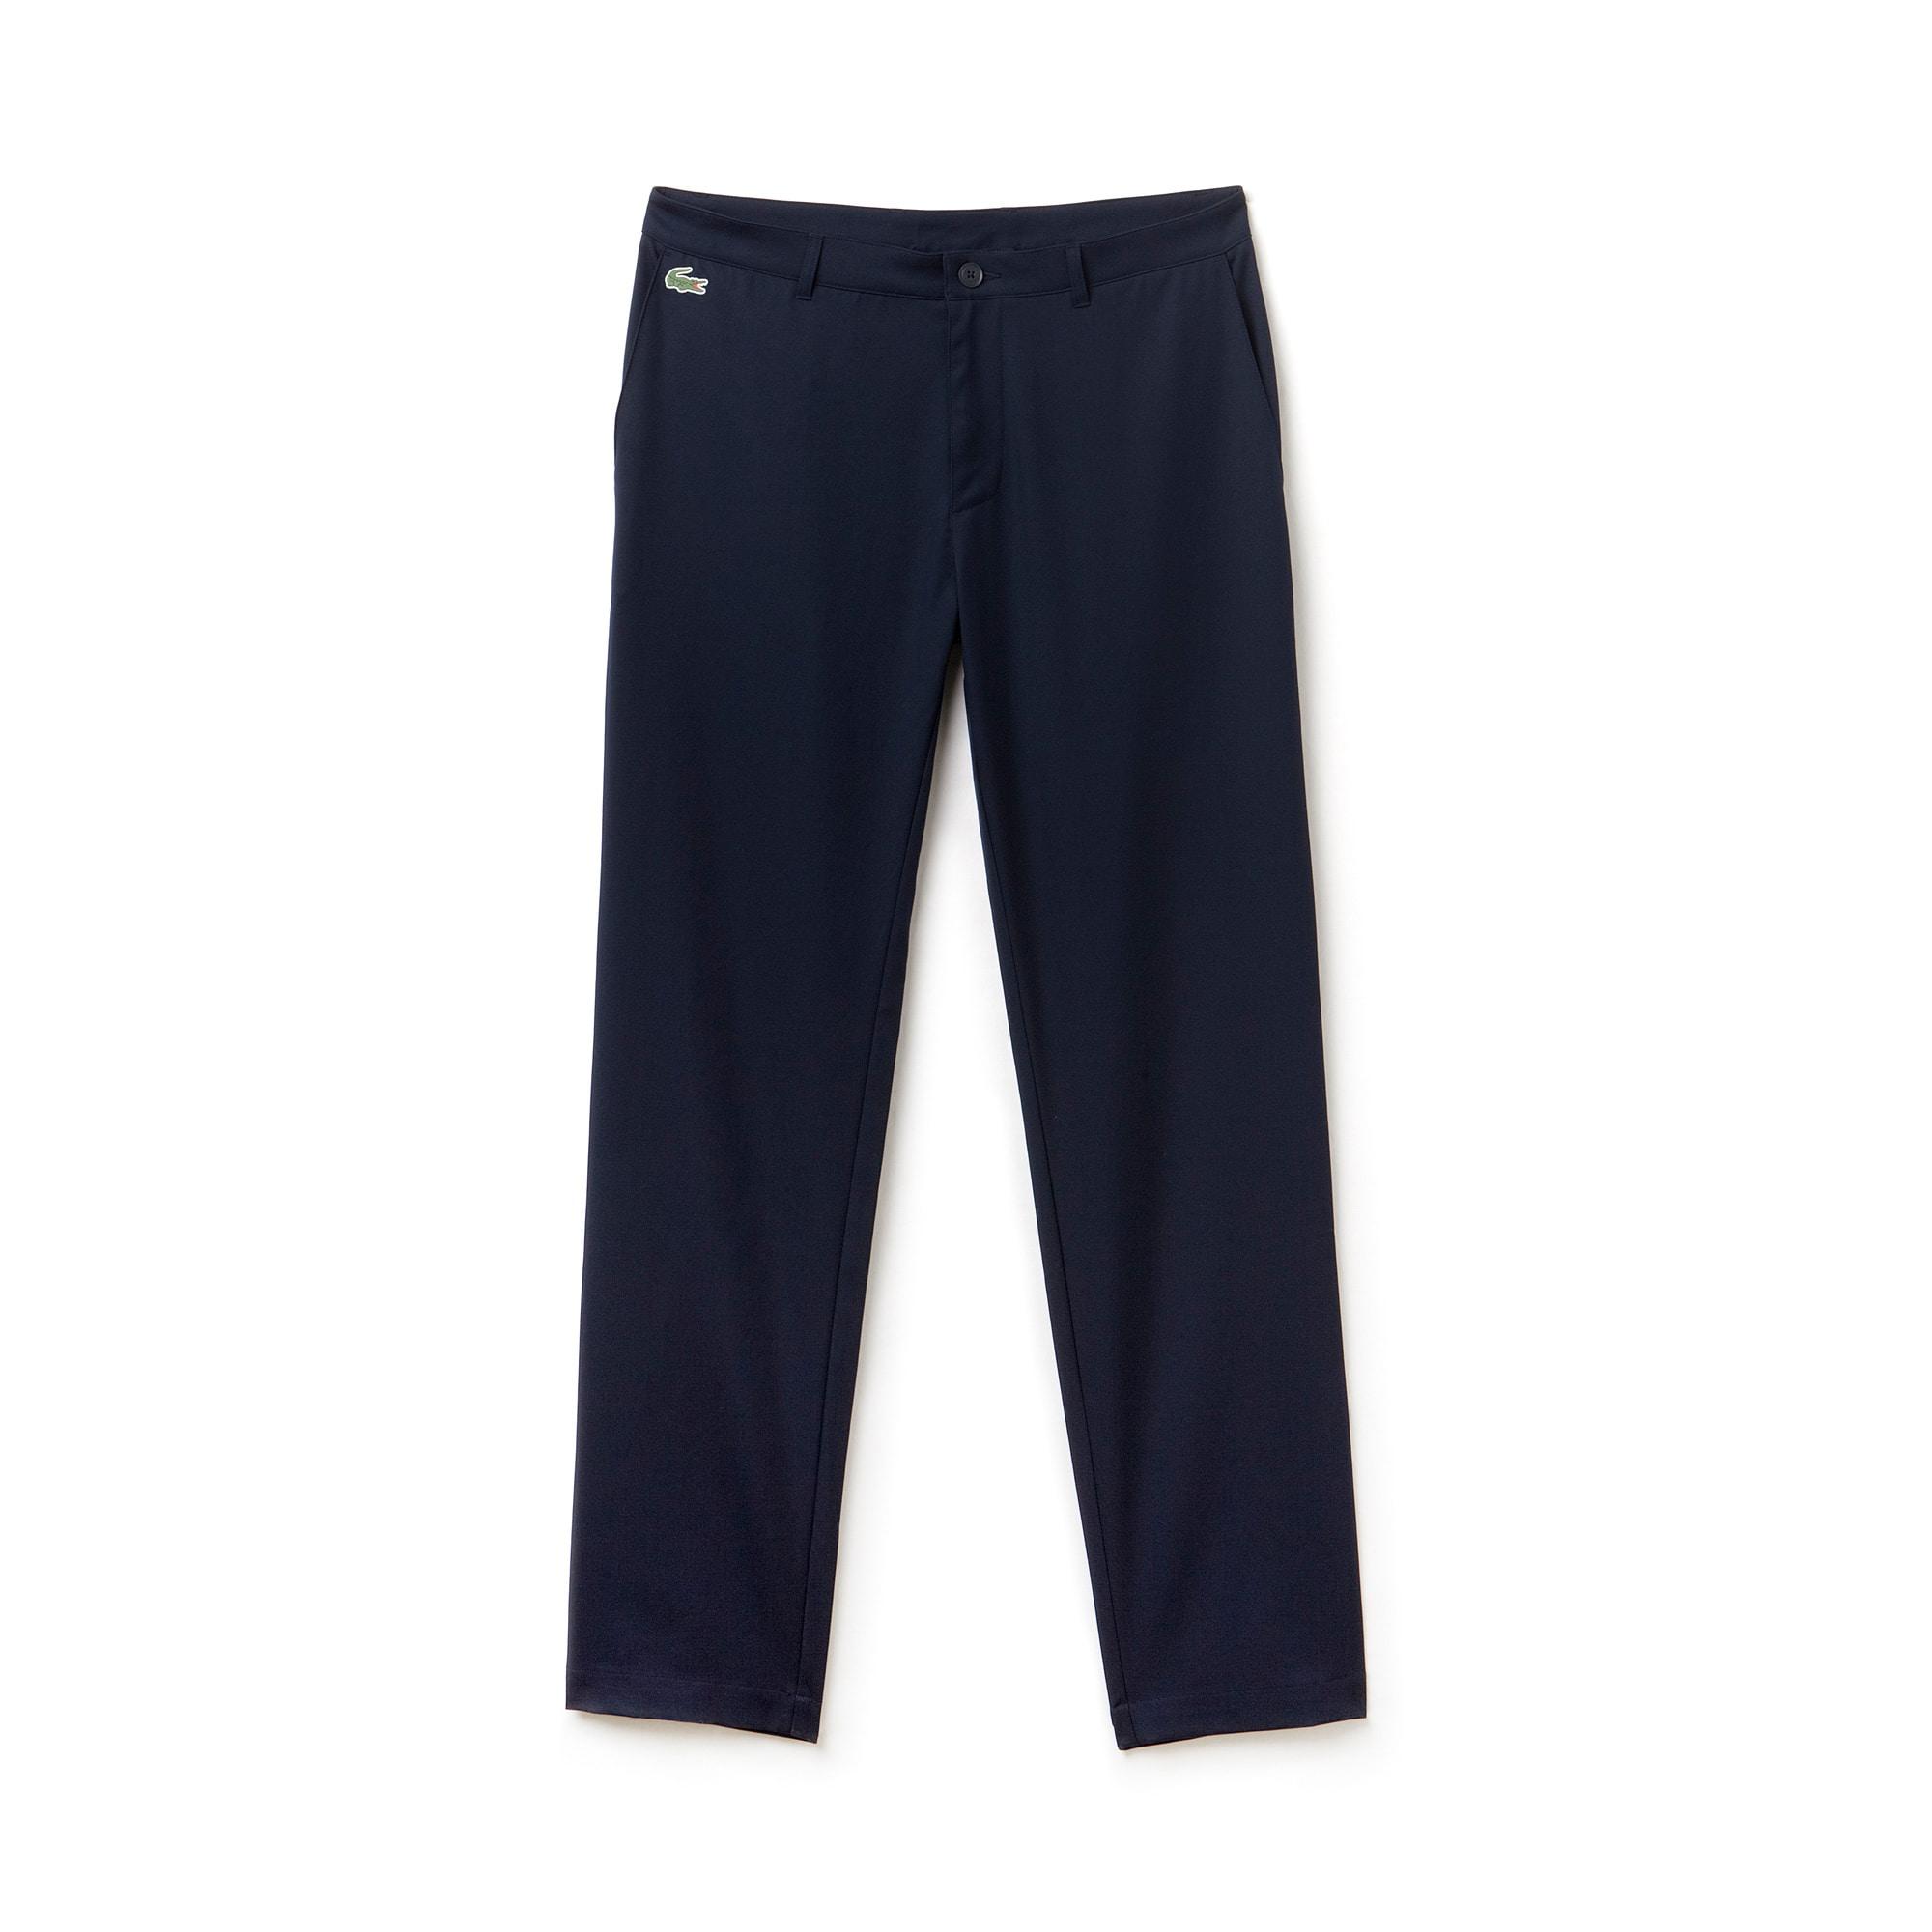 Pantalones chinos Lacoste Golf de gabardina técnica lisa